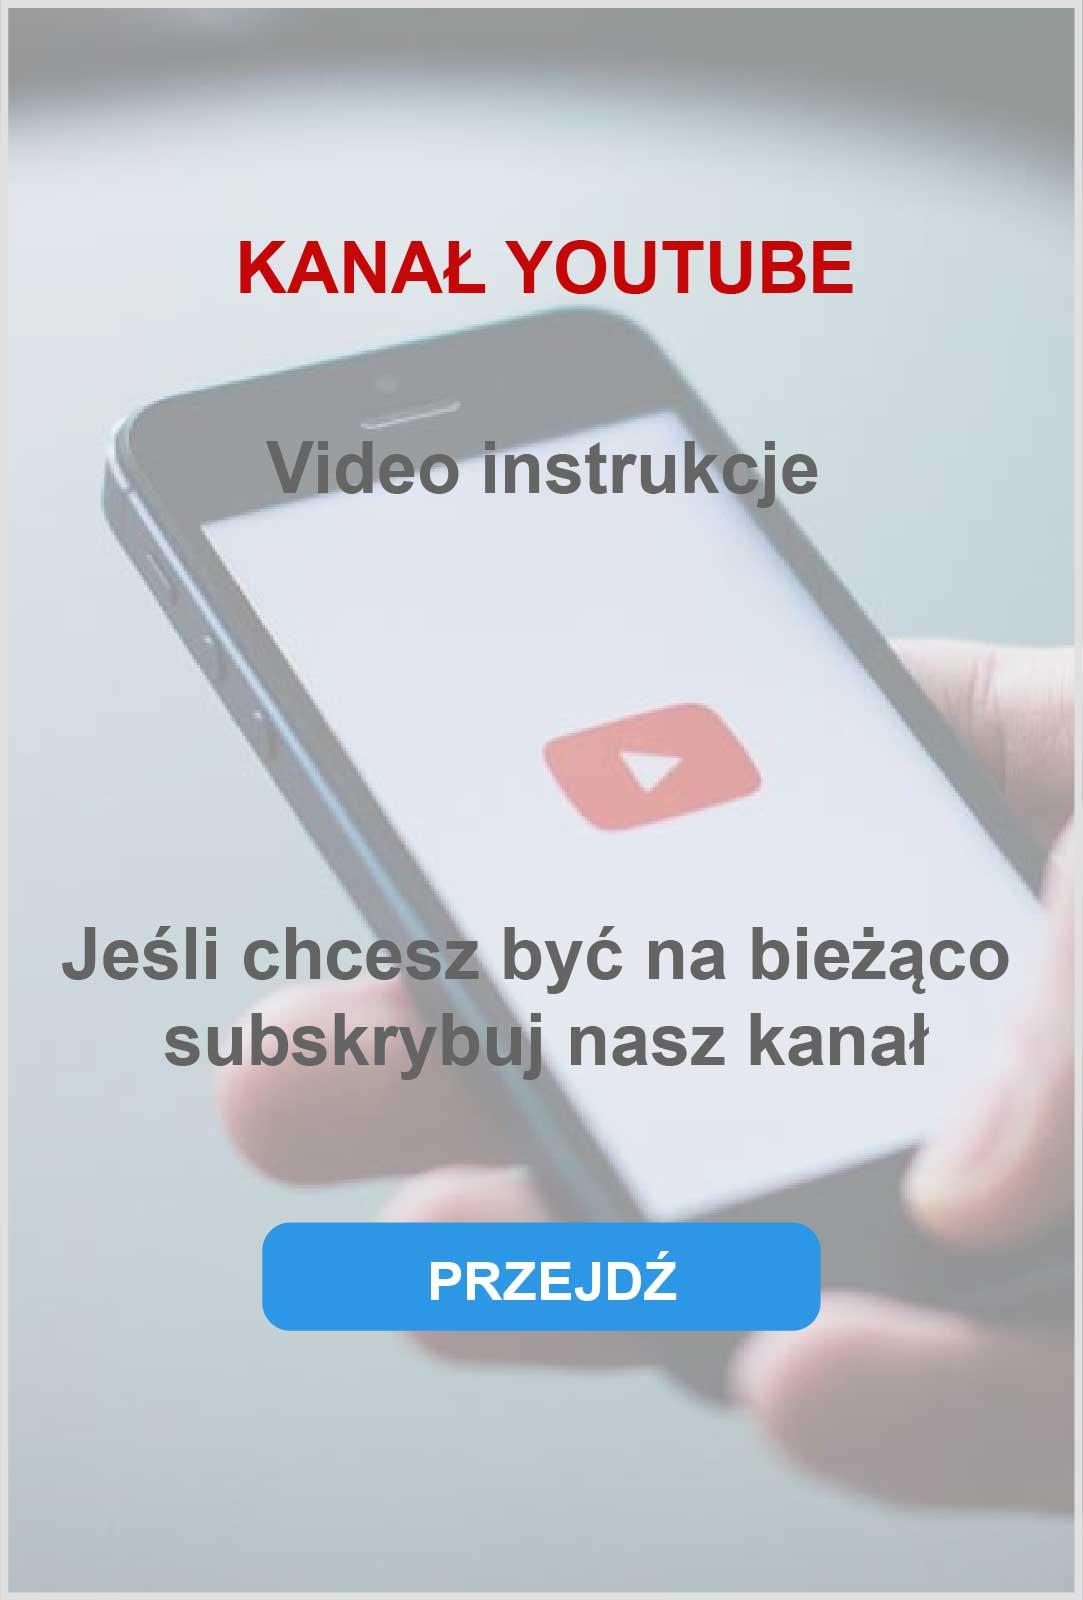 Oficjalny kanał YouTube sklepu Livolo